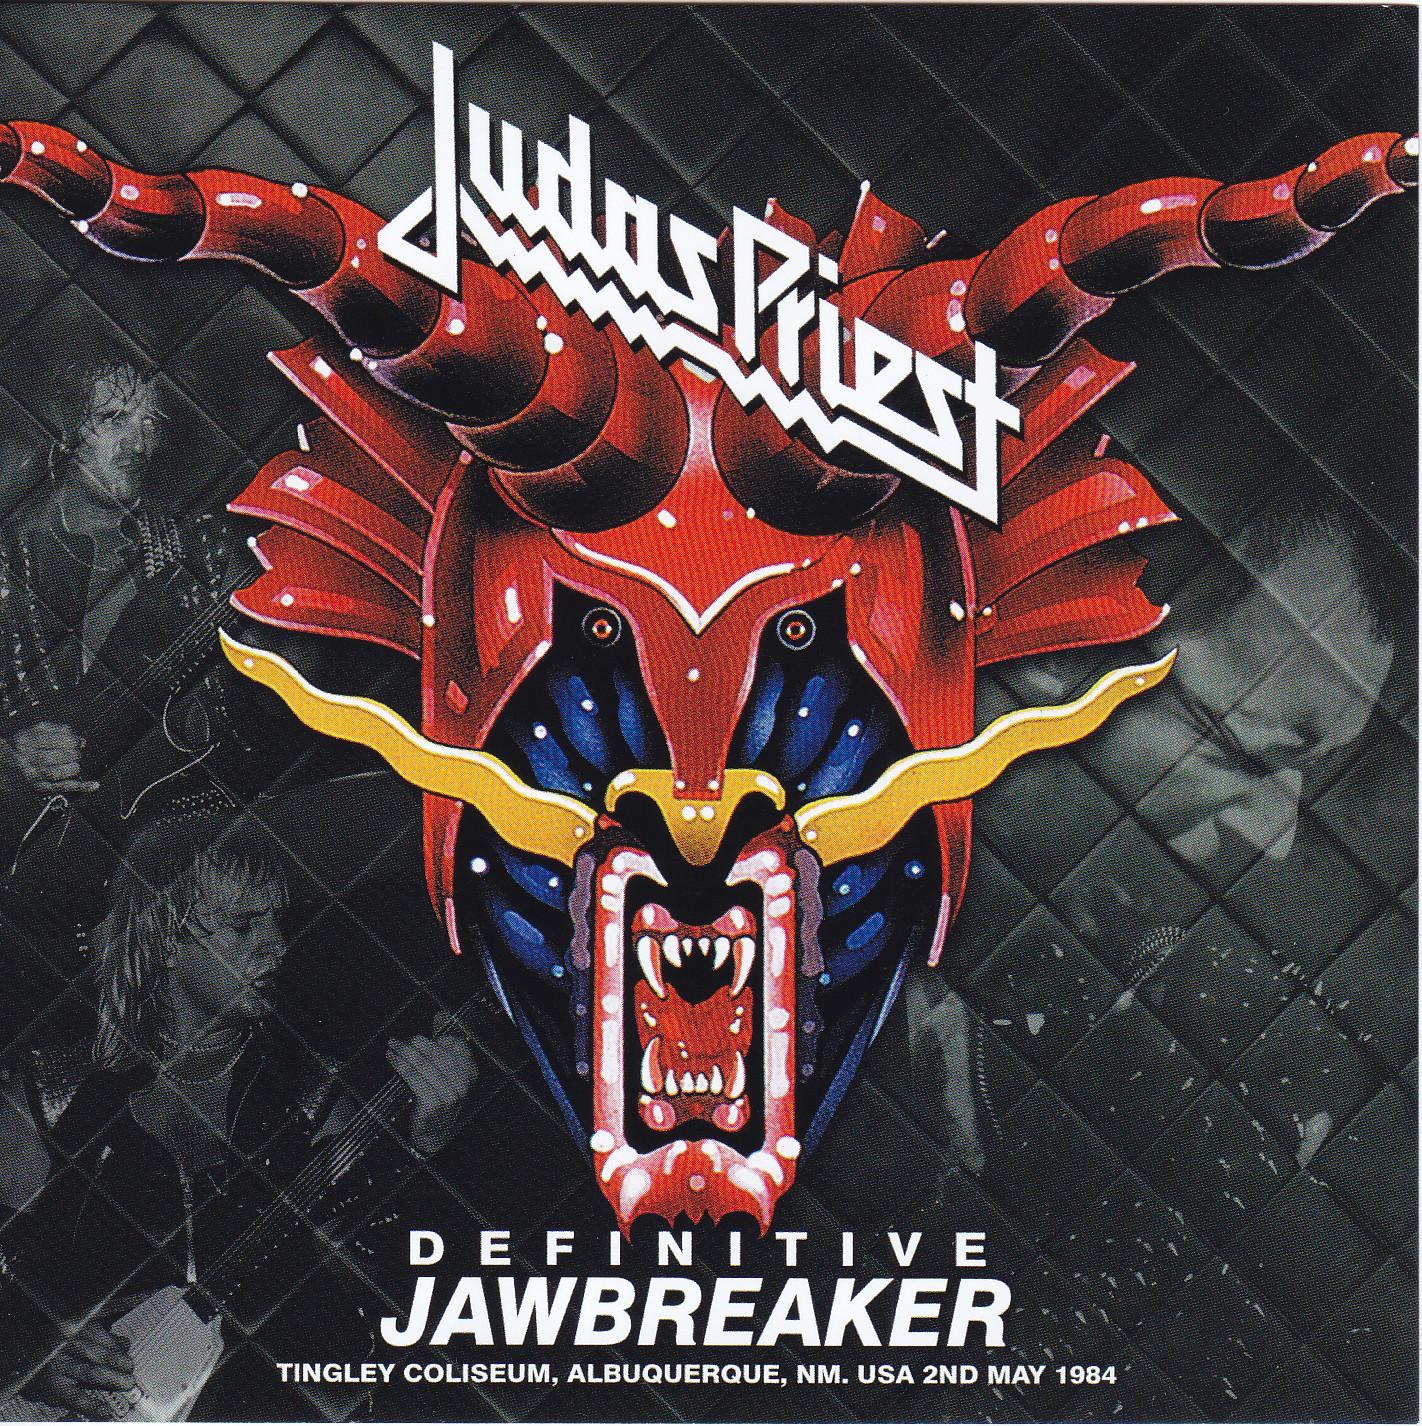 Judas Priest / Definitive Jawbreaker / 2CD – GiGinJapan